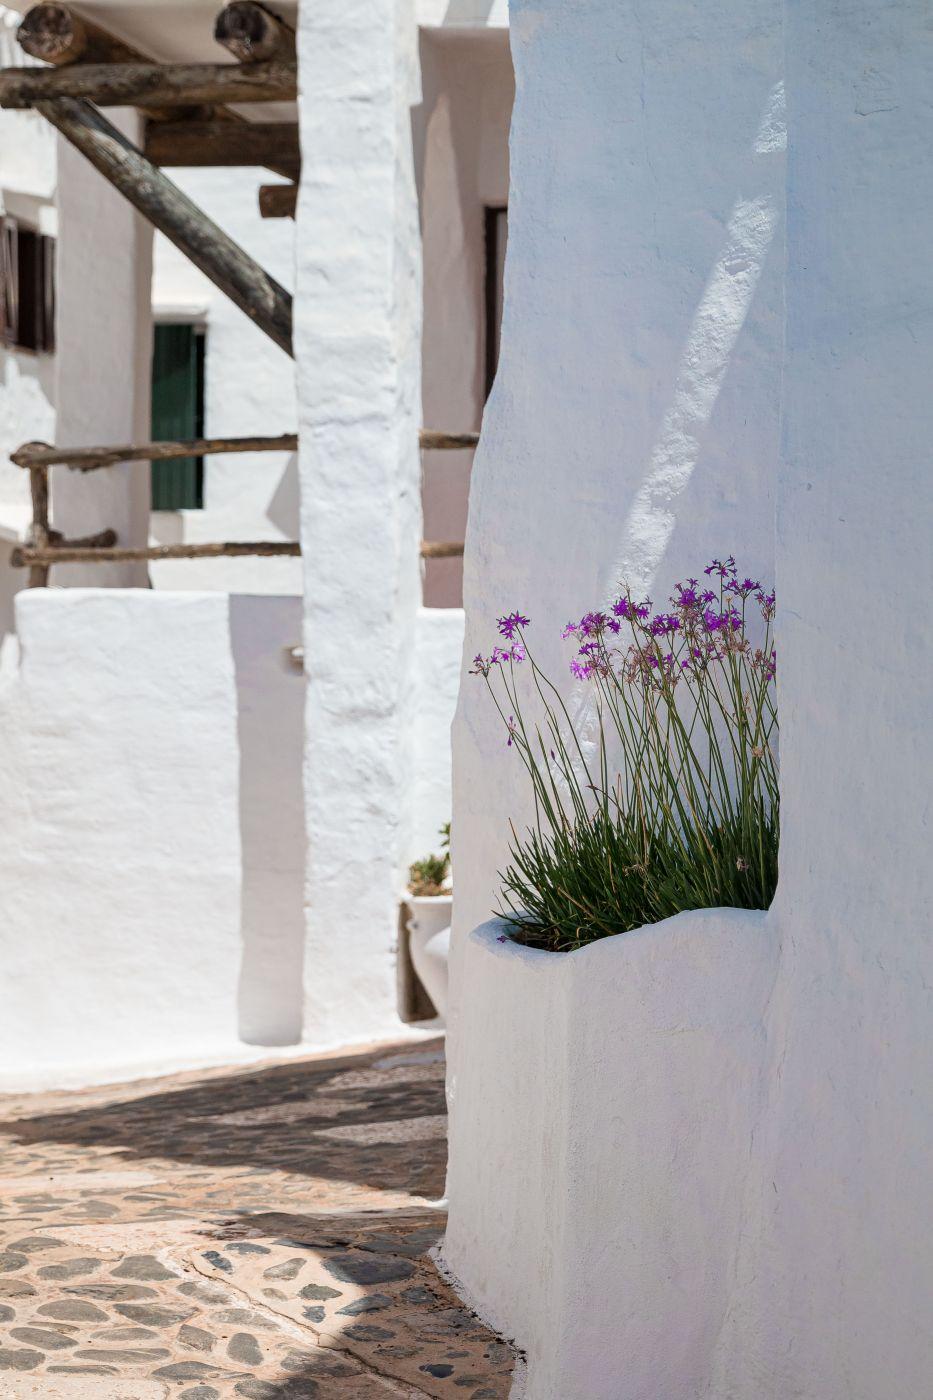 Binibequer, Spain